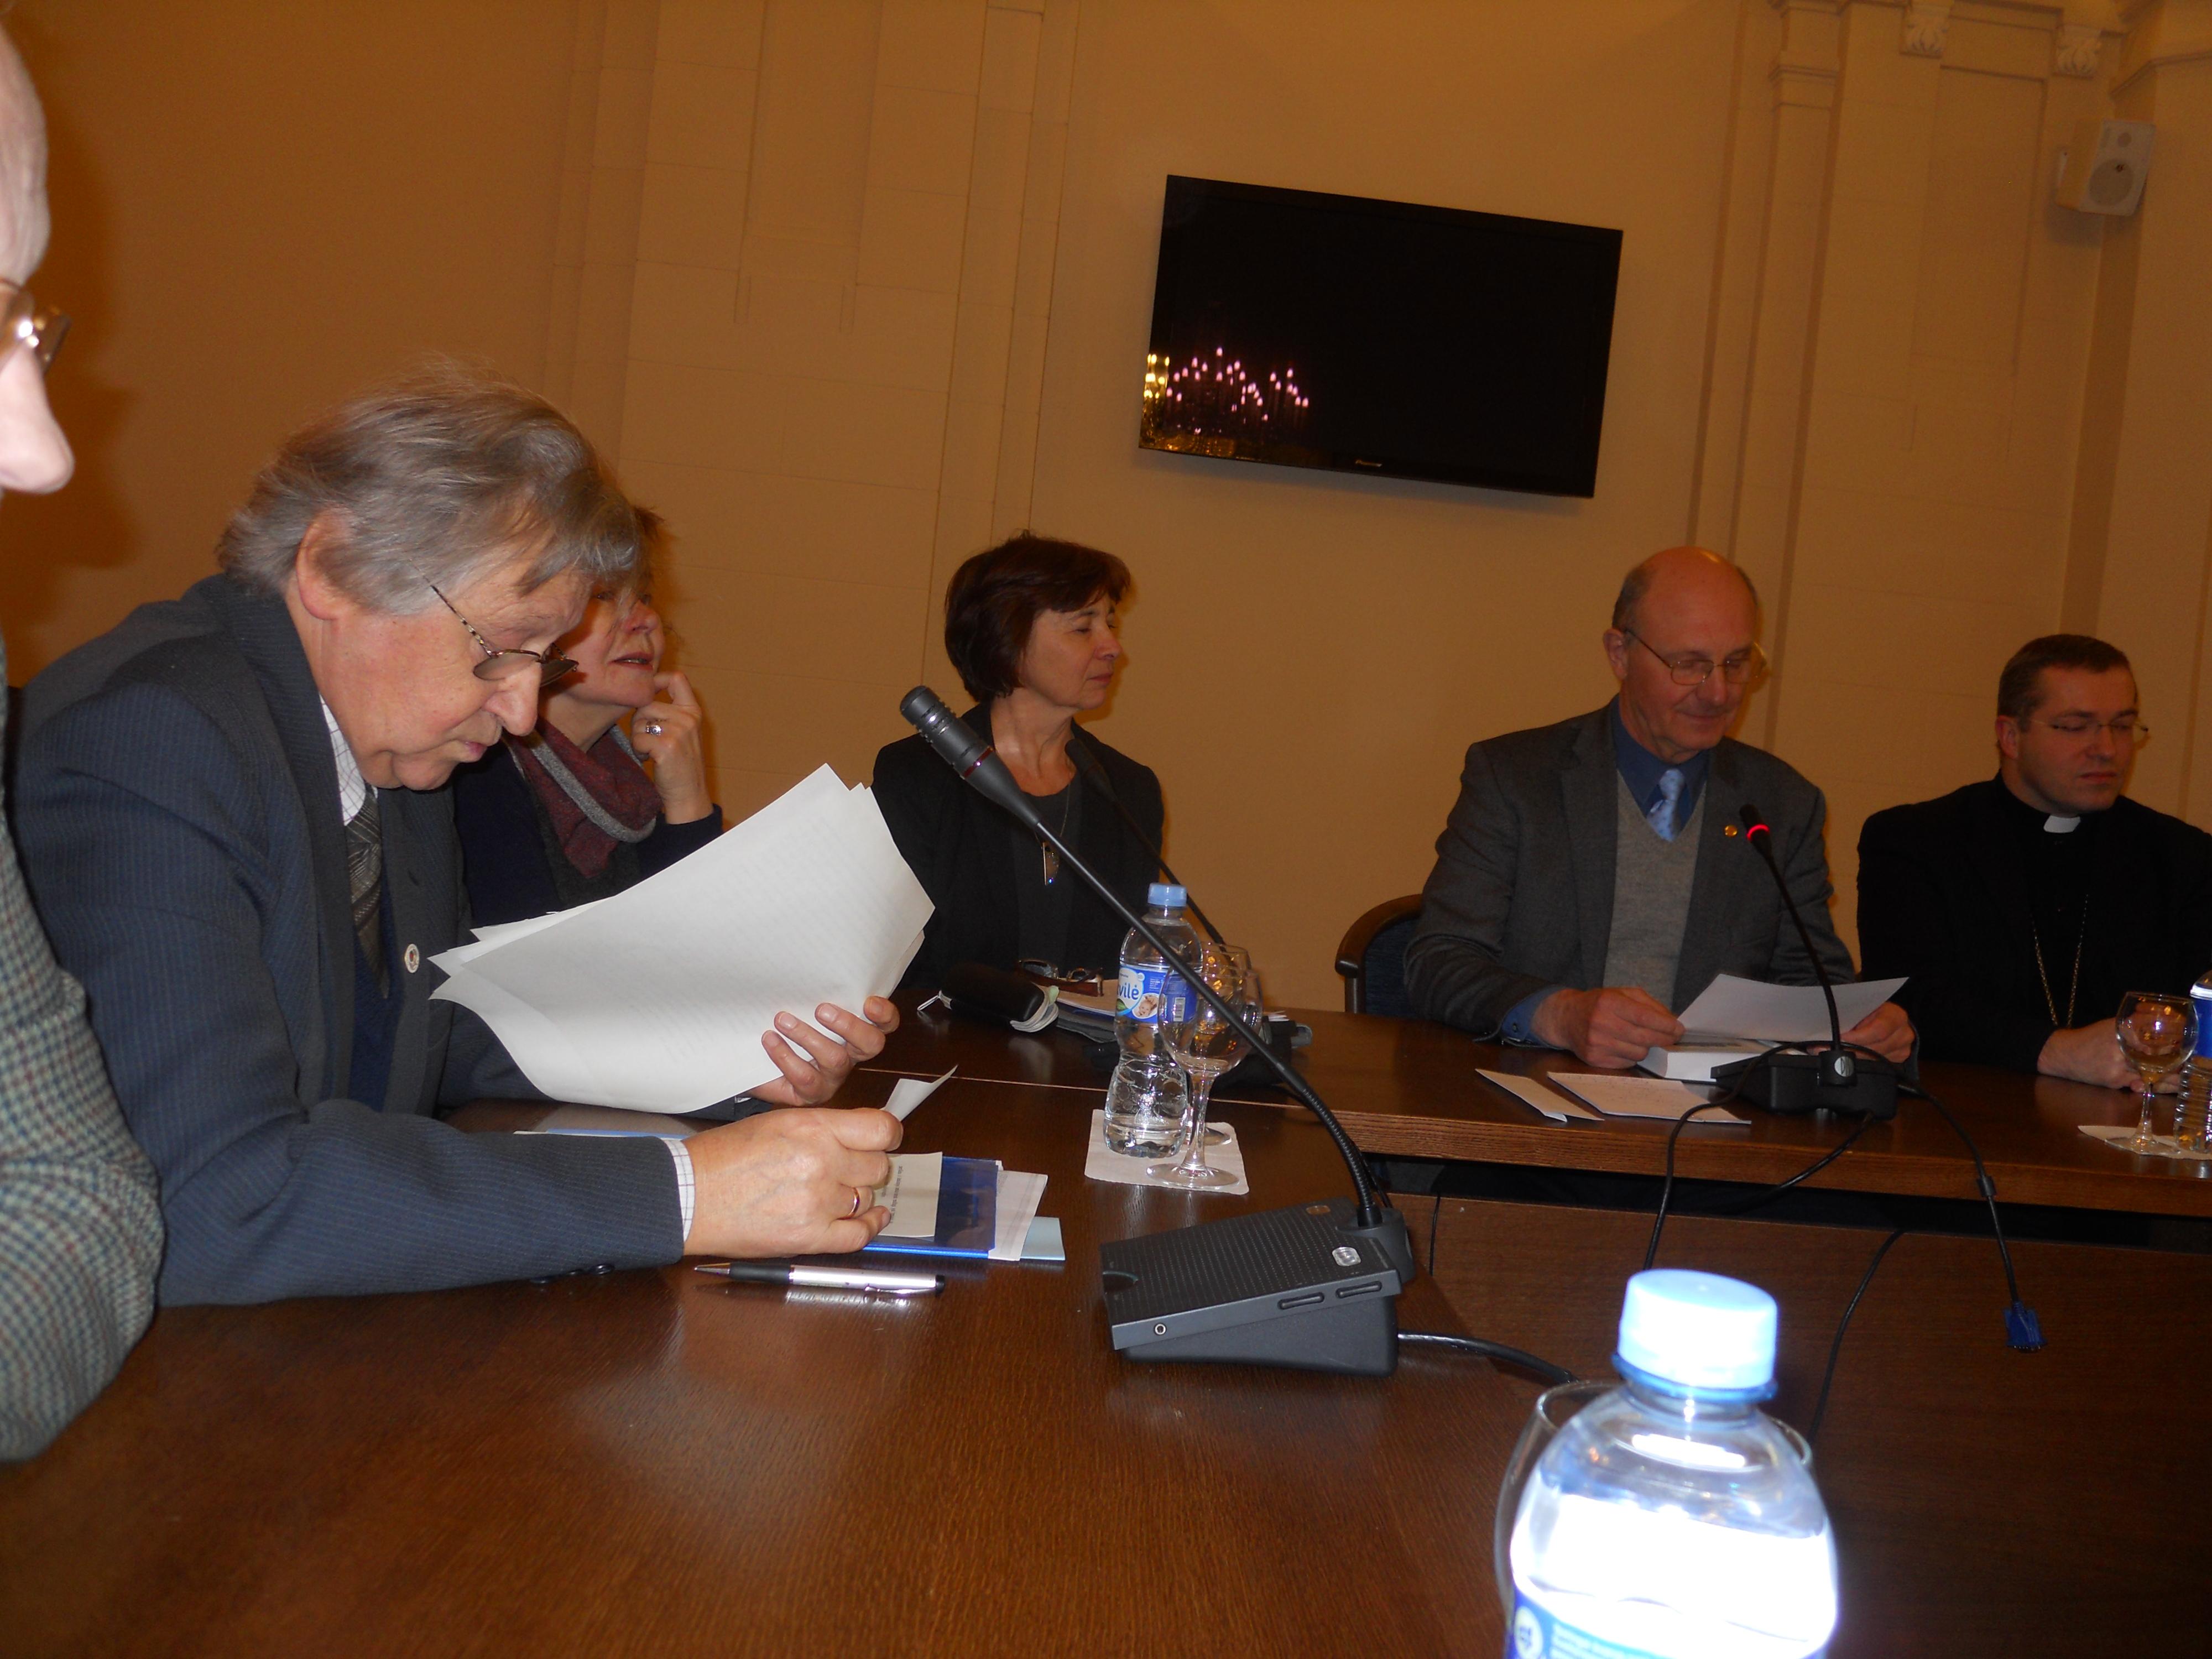 ys1 022 V. Bagdonavicius, A. Prasmantaite, D. Valentukeviciene, D. Kaunas, M. Sabutis 2014 11 25